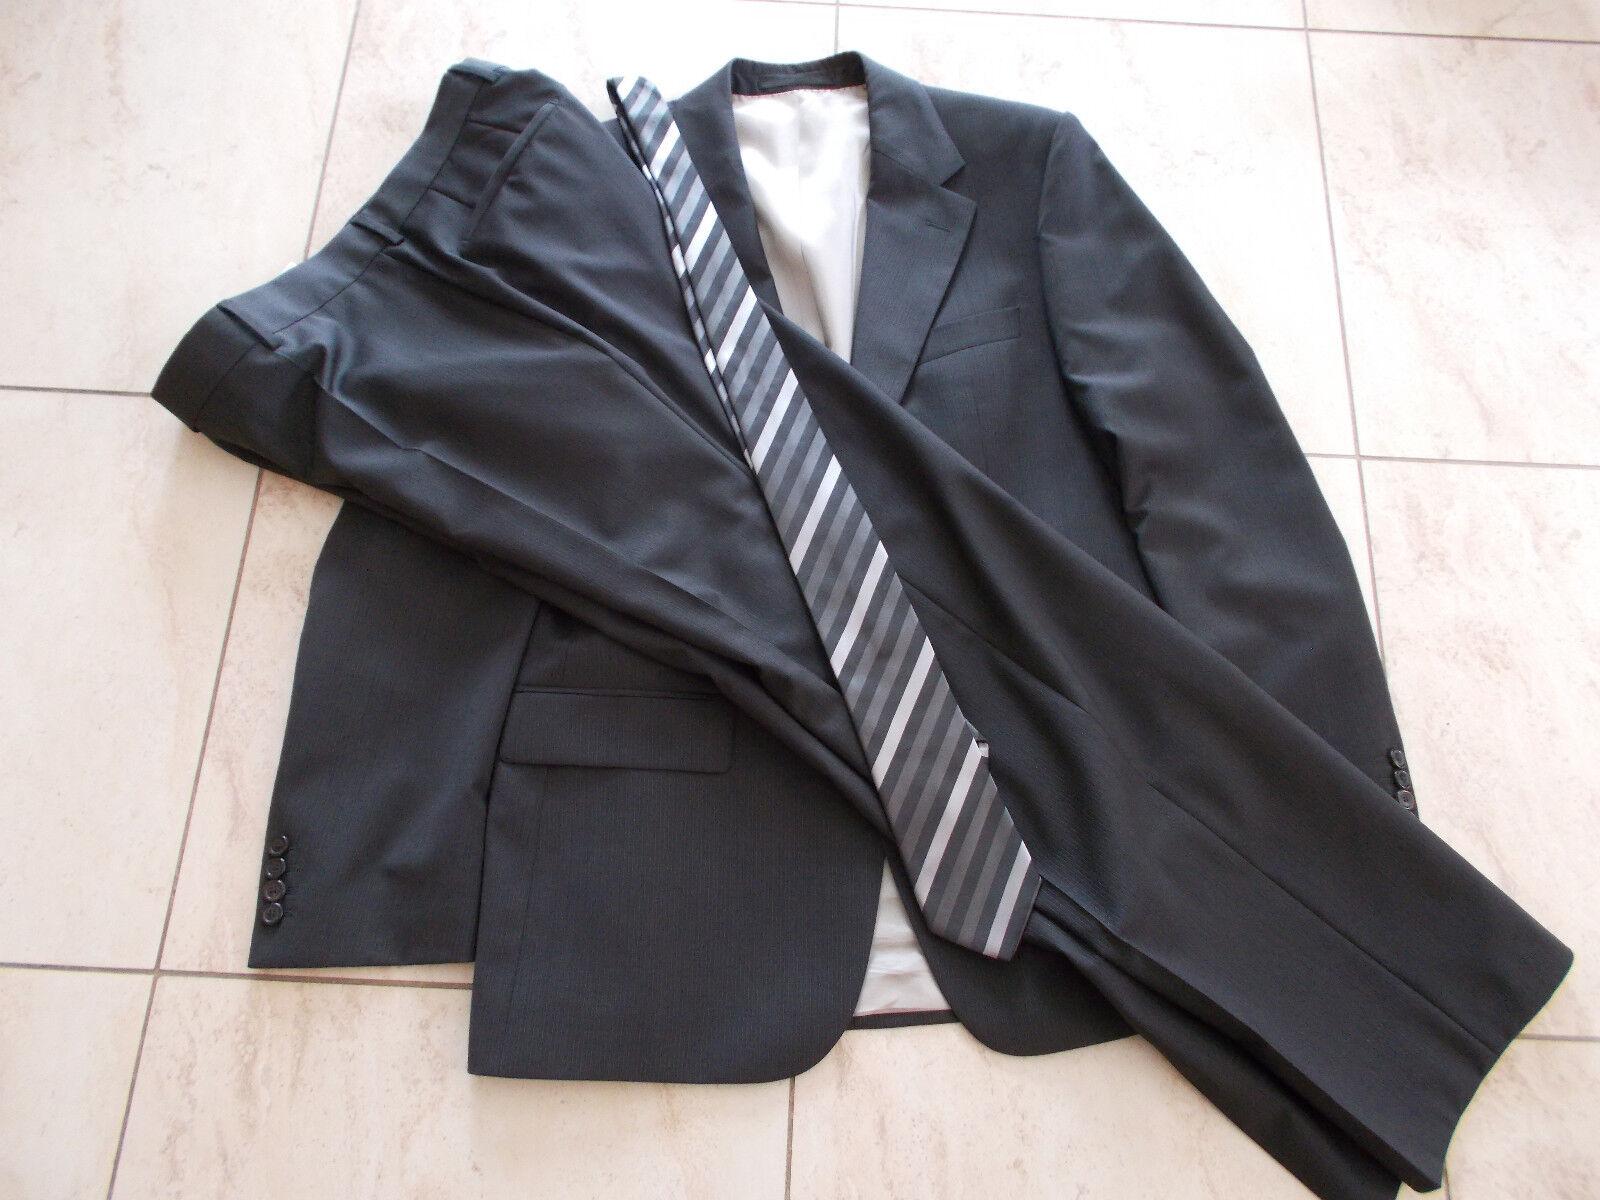 Hugo Boss Anzug Gr.50 Gable Vegas Nadelstreifenanzug